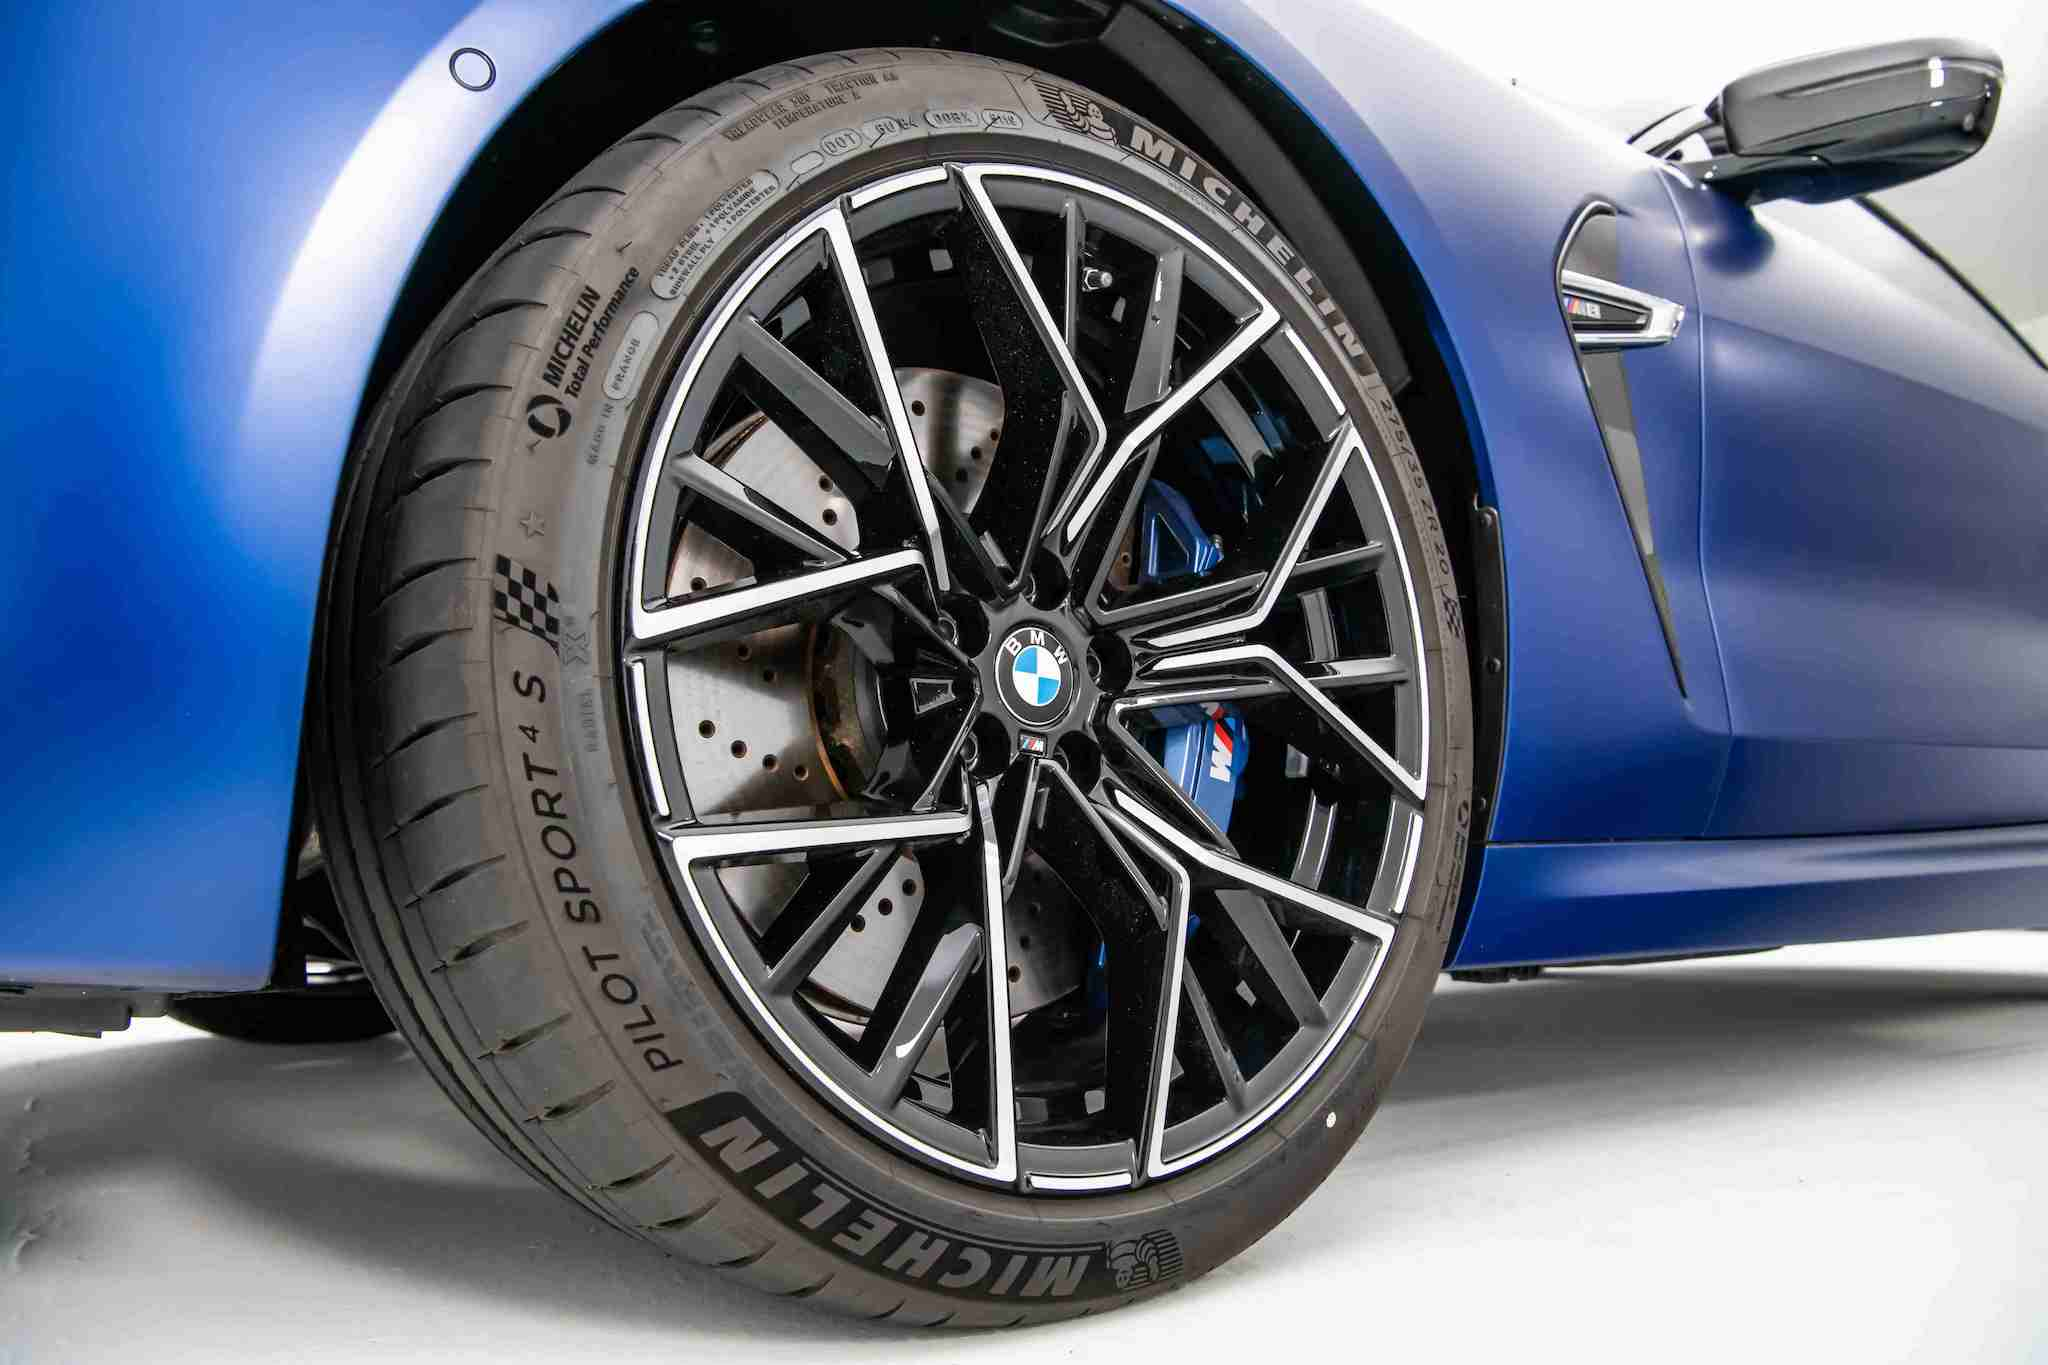 全新 BMW M8 專屬的 20 吋 M 星幅式 811M 型輪圈。